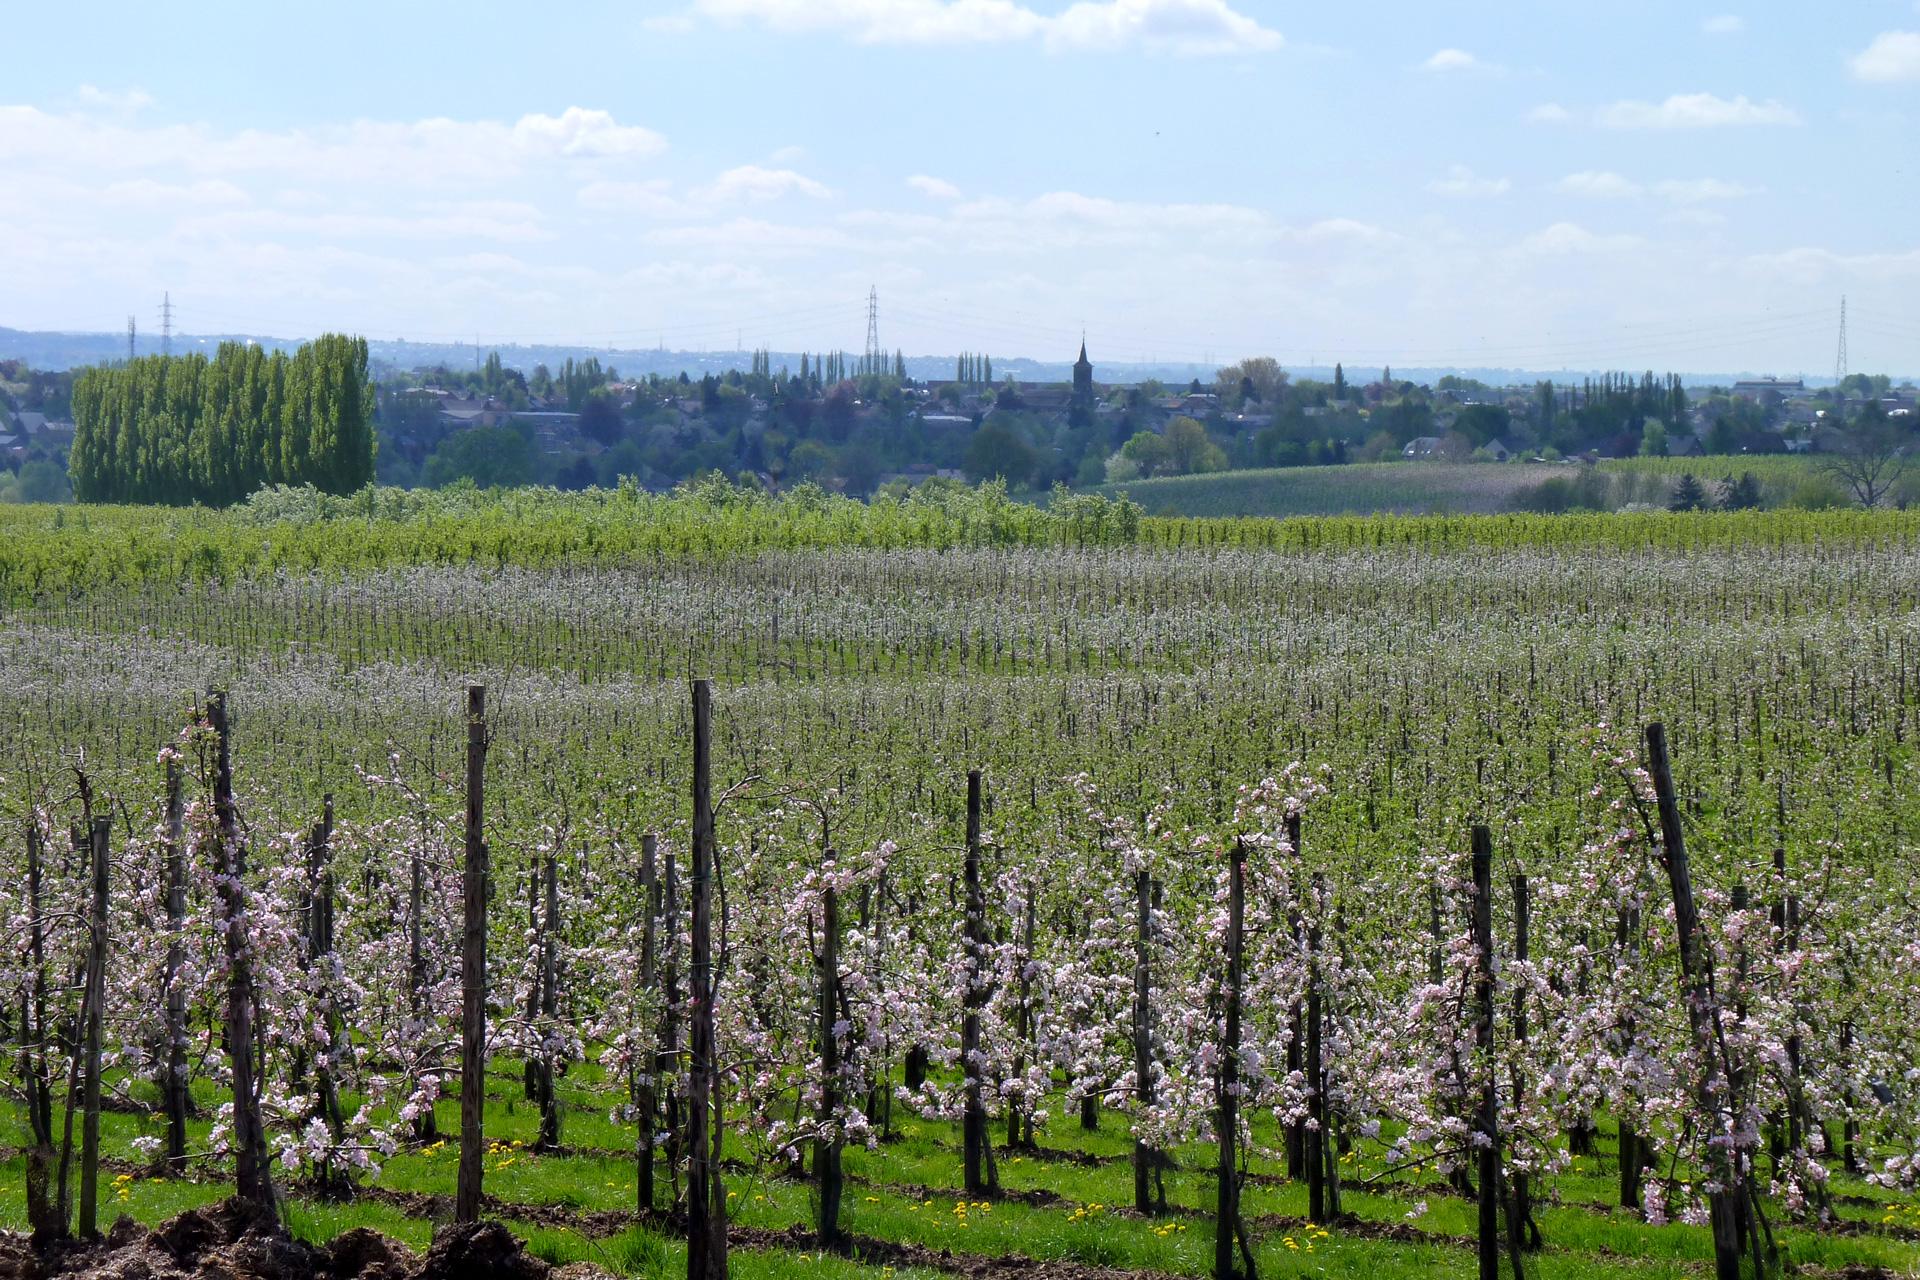 oupeye-fruiticulture-poiriers-a-hermee-photo-bernard-jacqmin